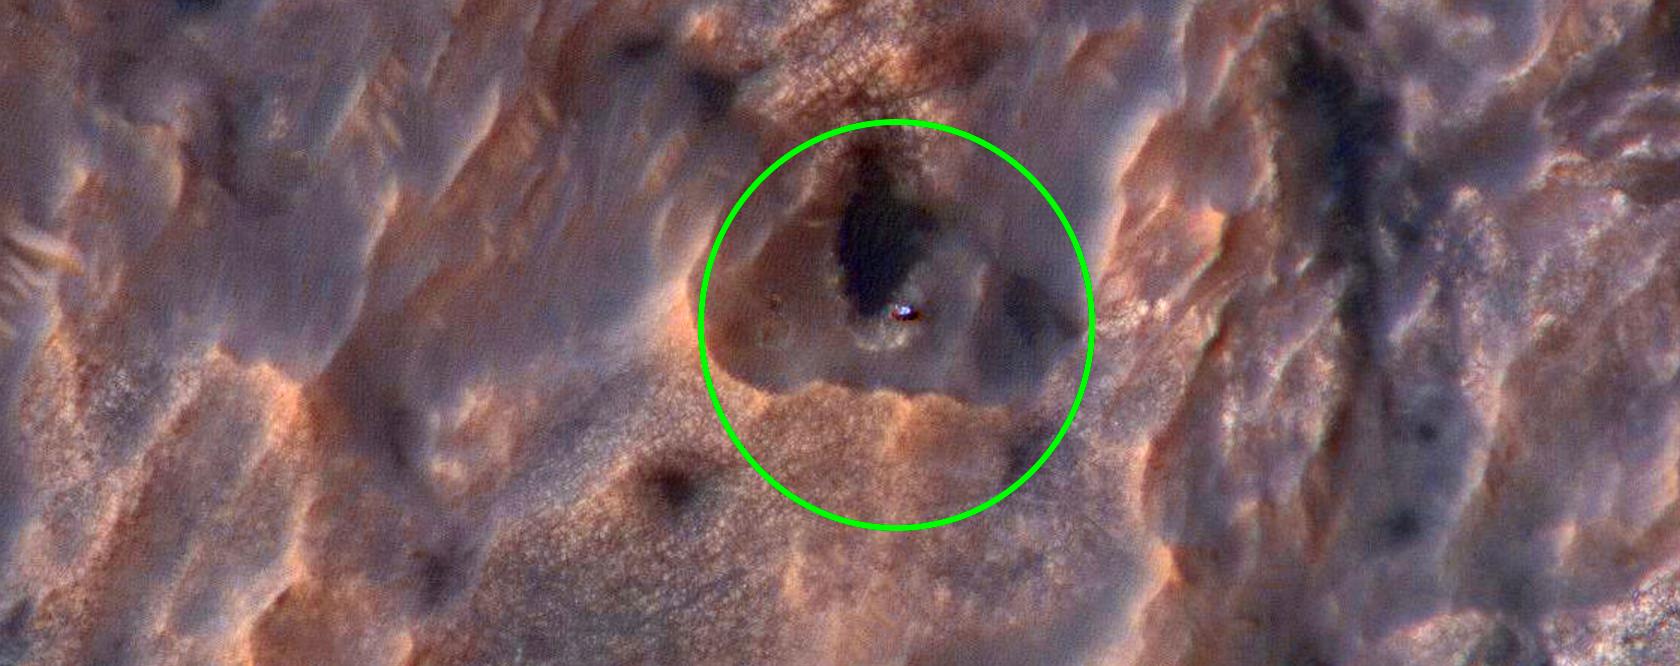 Curiosity Rover on the Move